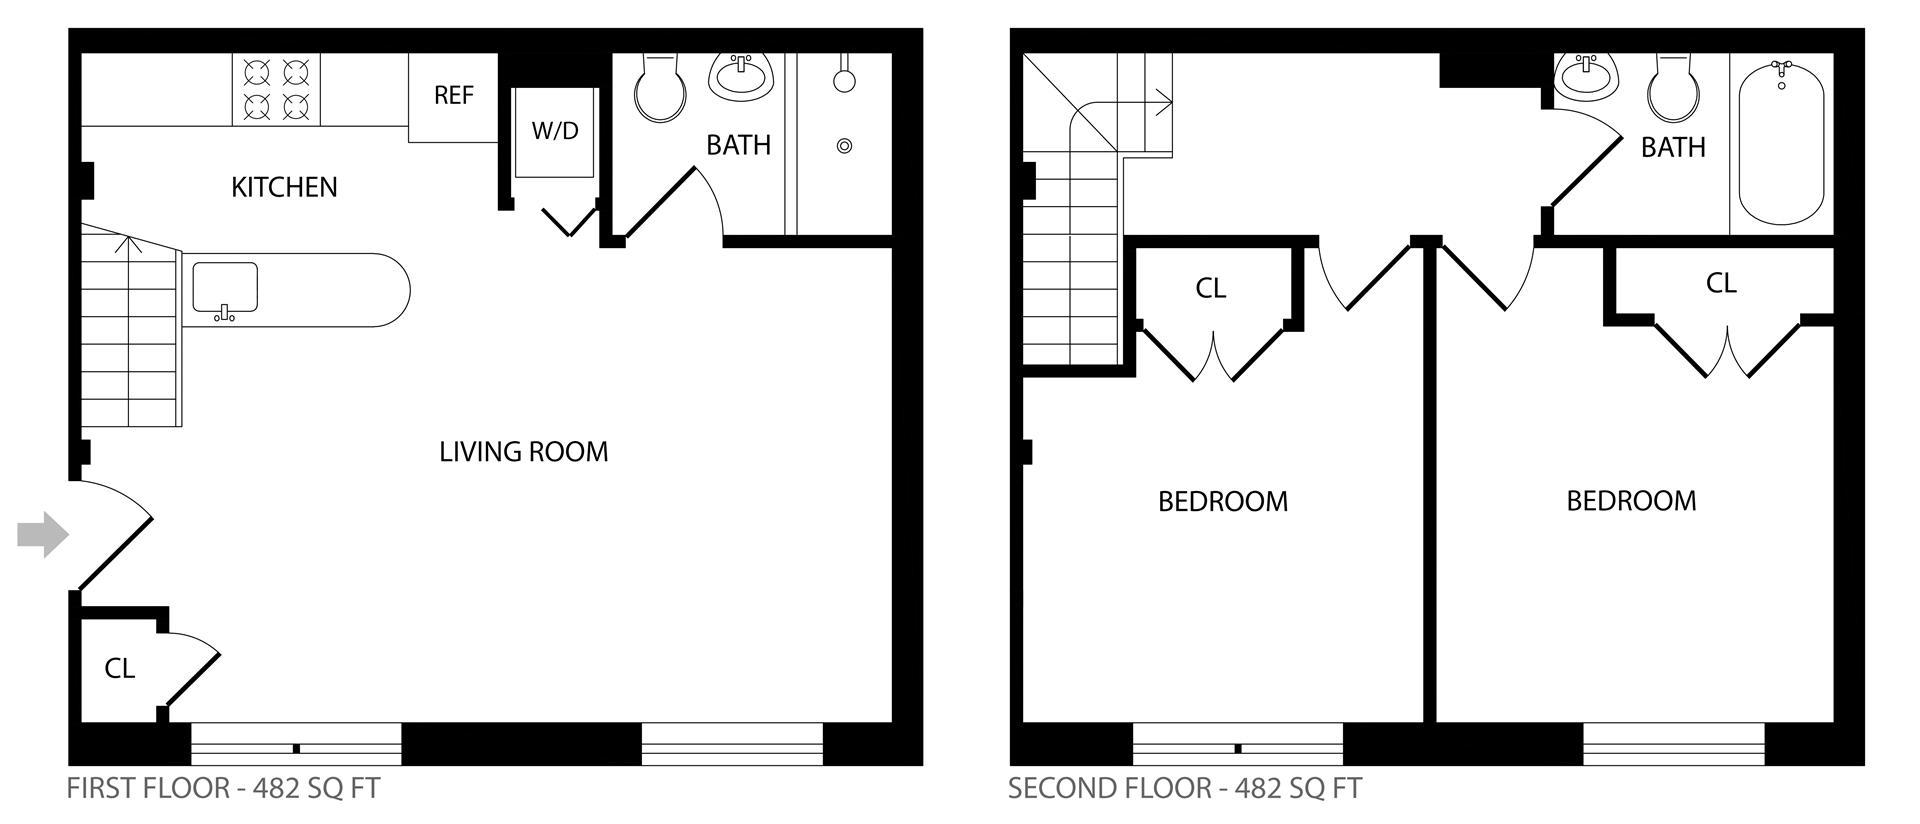 Floor plan of 117 Kingsland Avenue, 1B - Greenpoint, New York